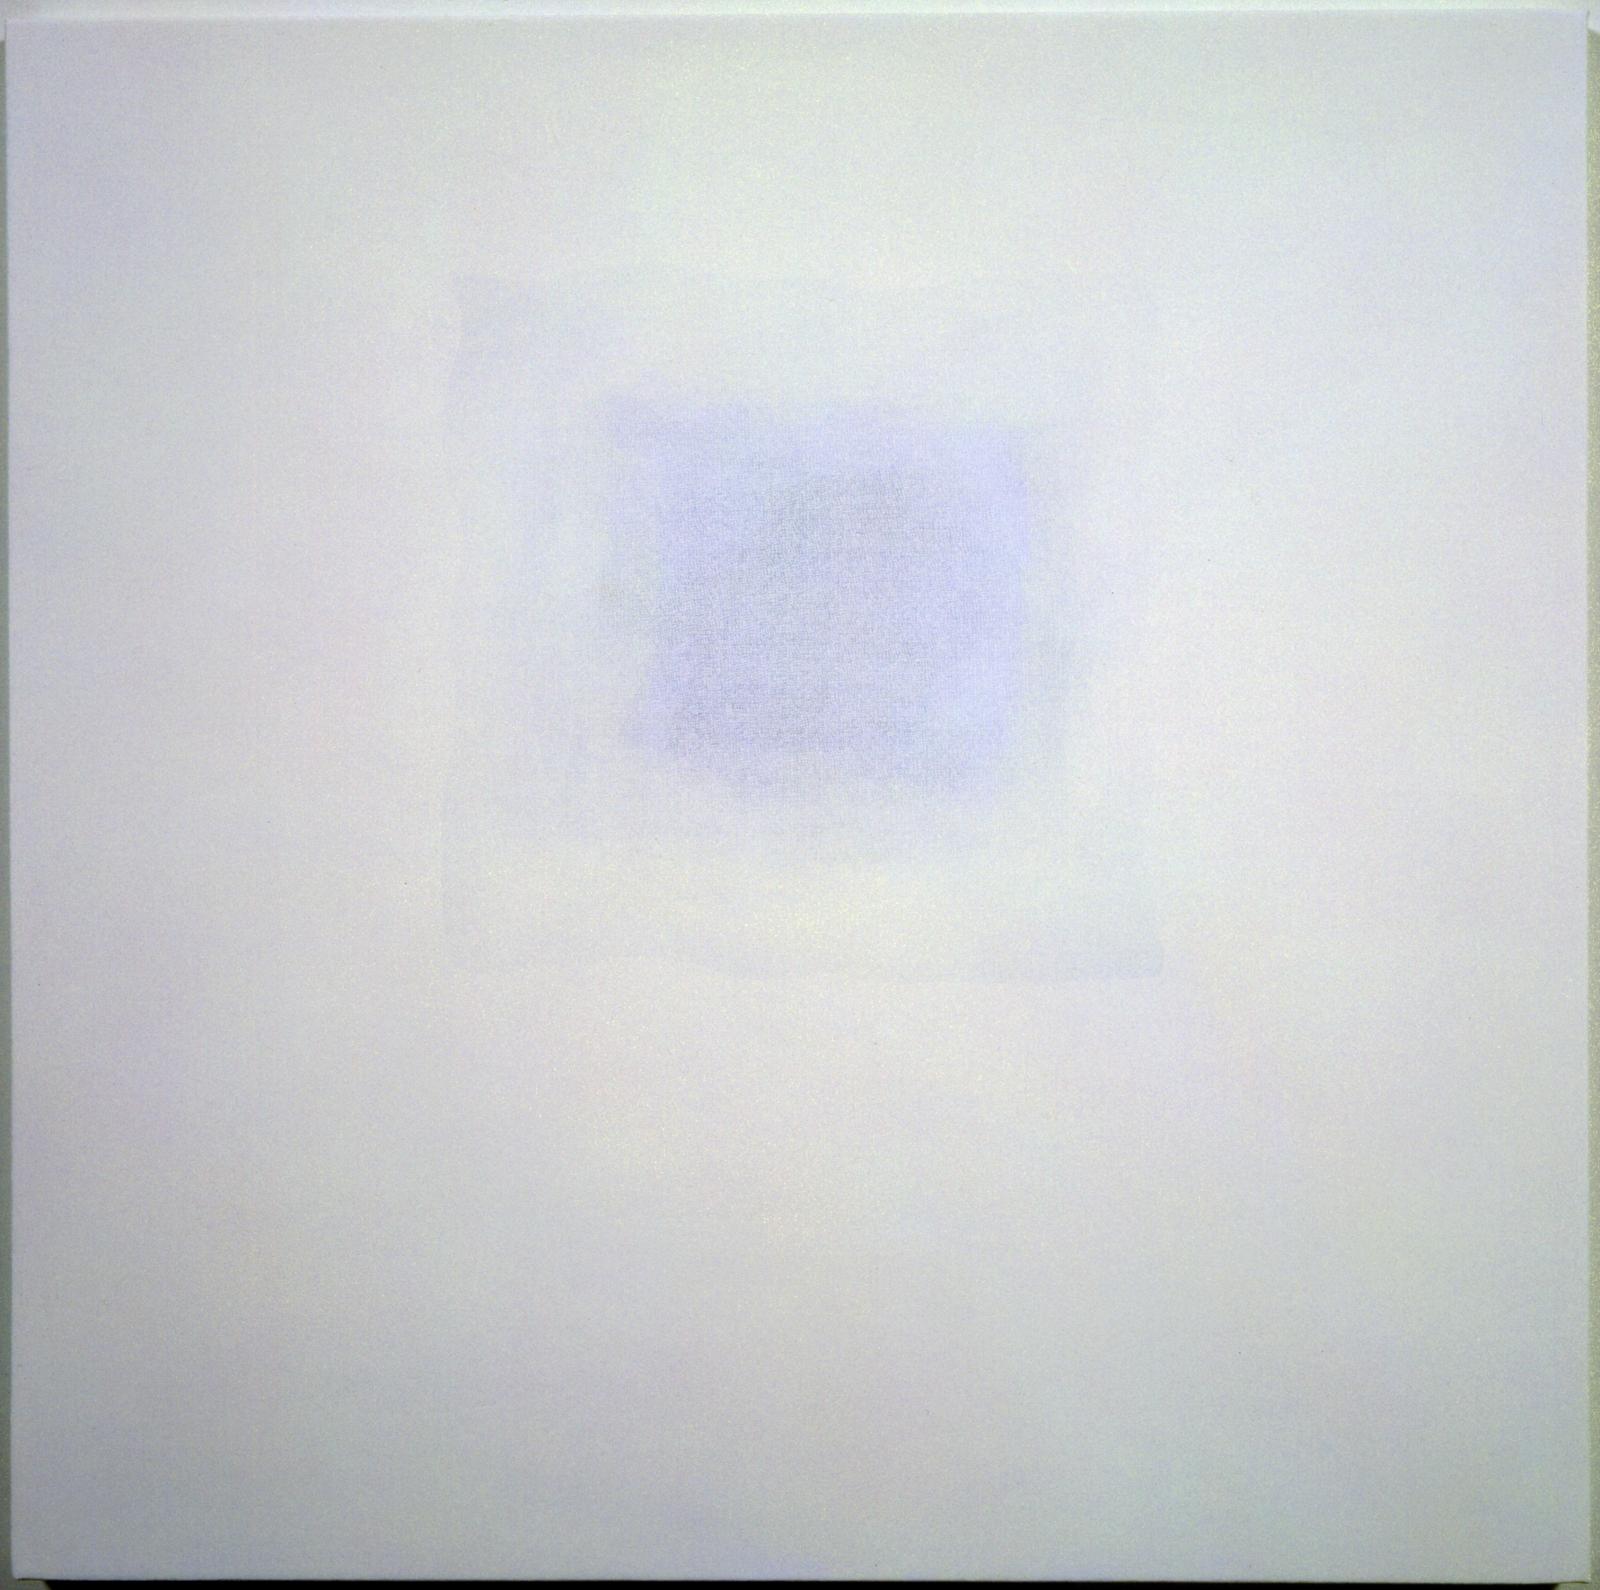 SHIRAZEH HOUSHIARY, Warp and weft, 1999